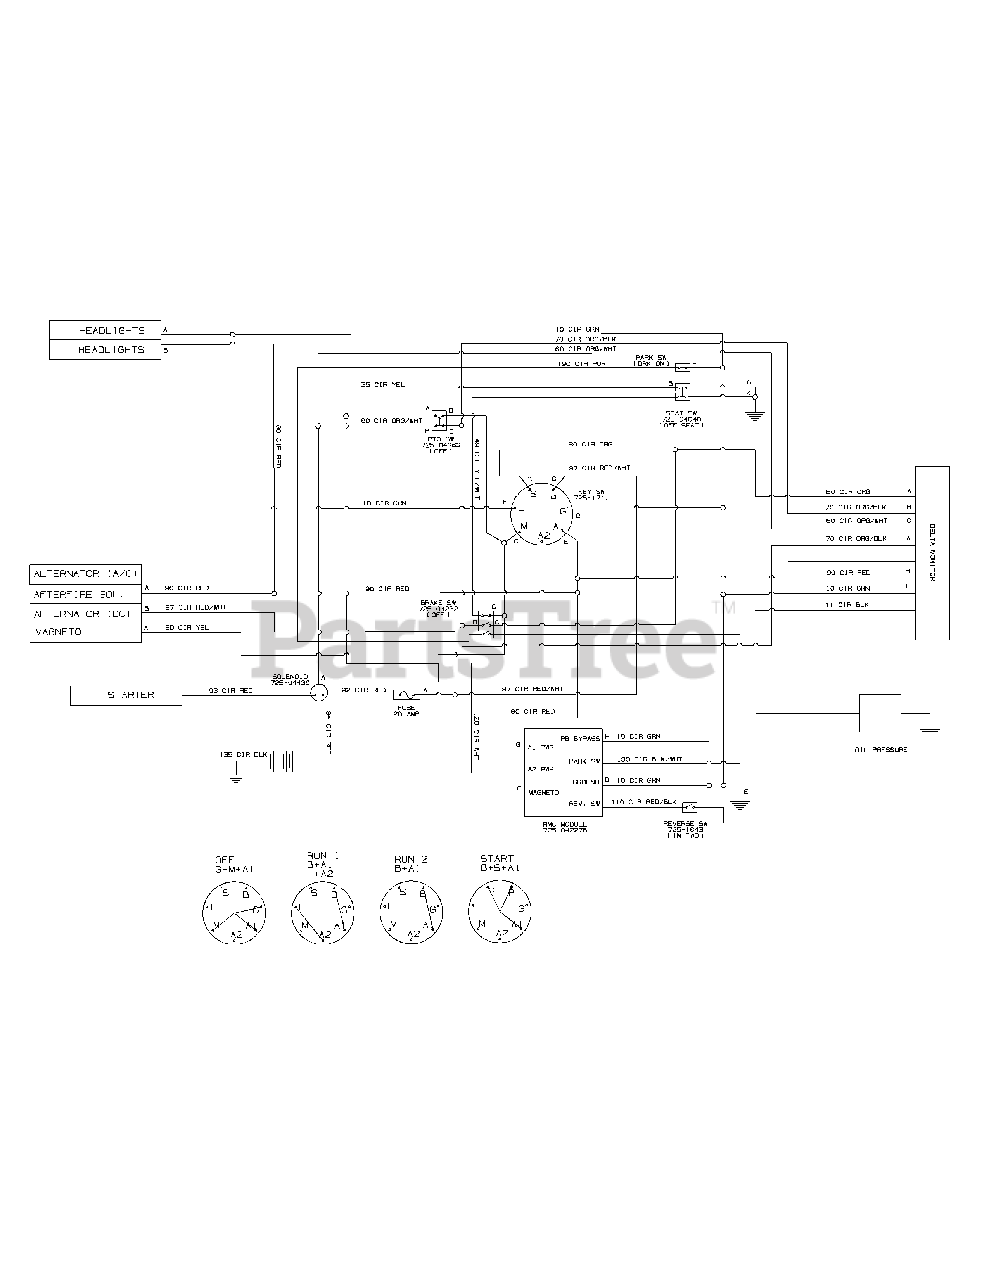 2135 cub cadet wiring diagram cub cadet 1045 electrical schematic wiring diagram  cub cadet 1045 electrical schematic